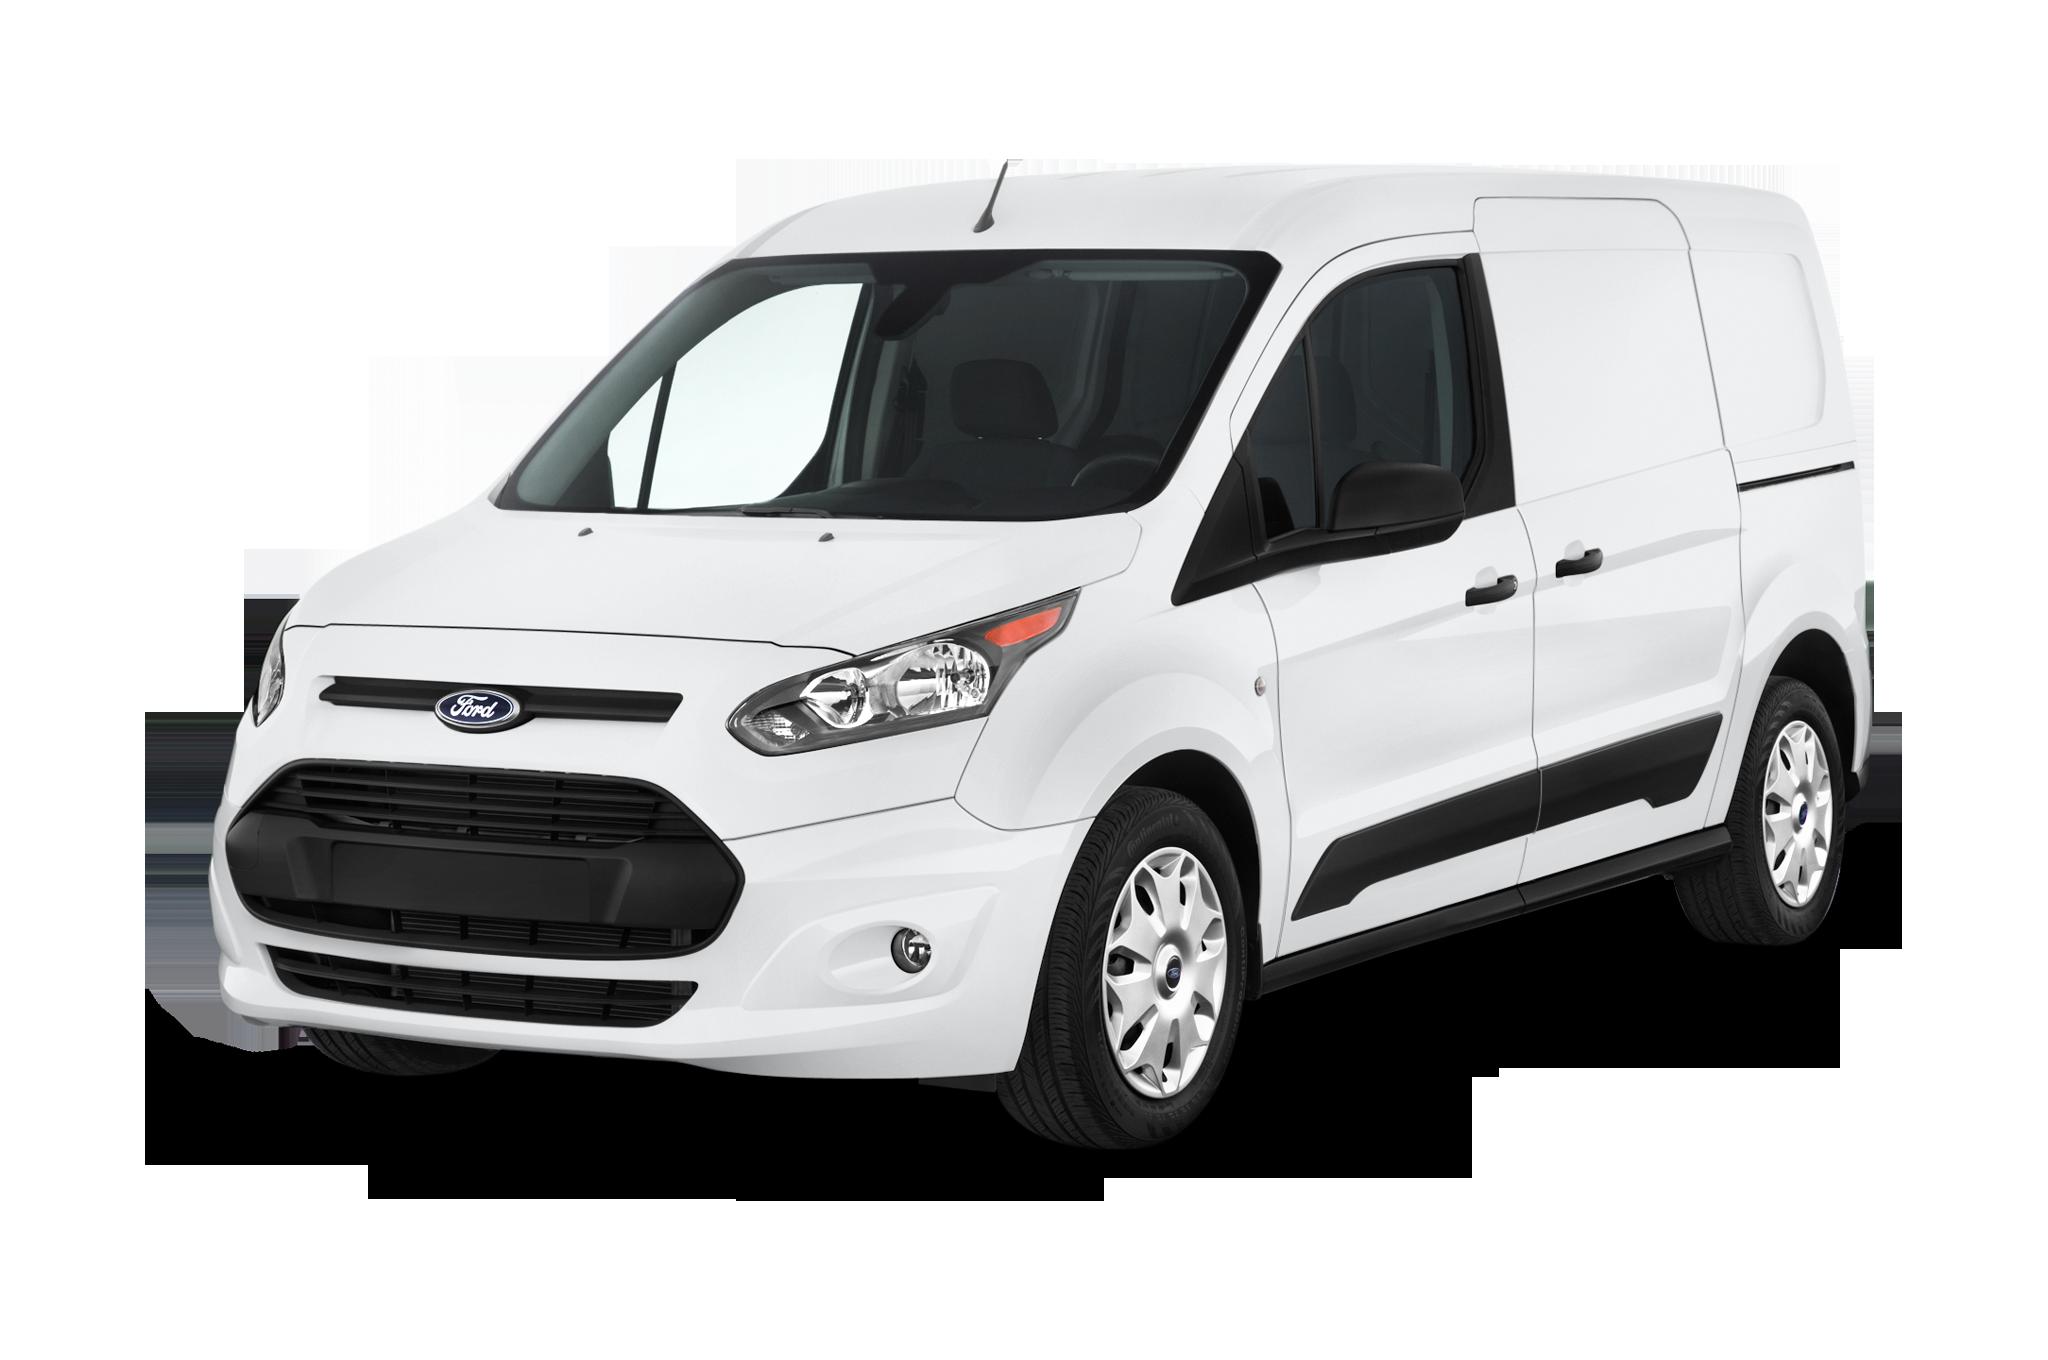 Minivan clipart van cargo. Ford takes on the